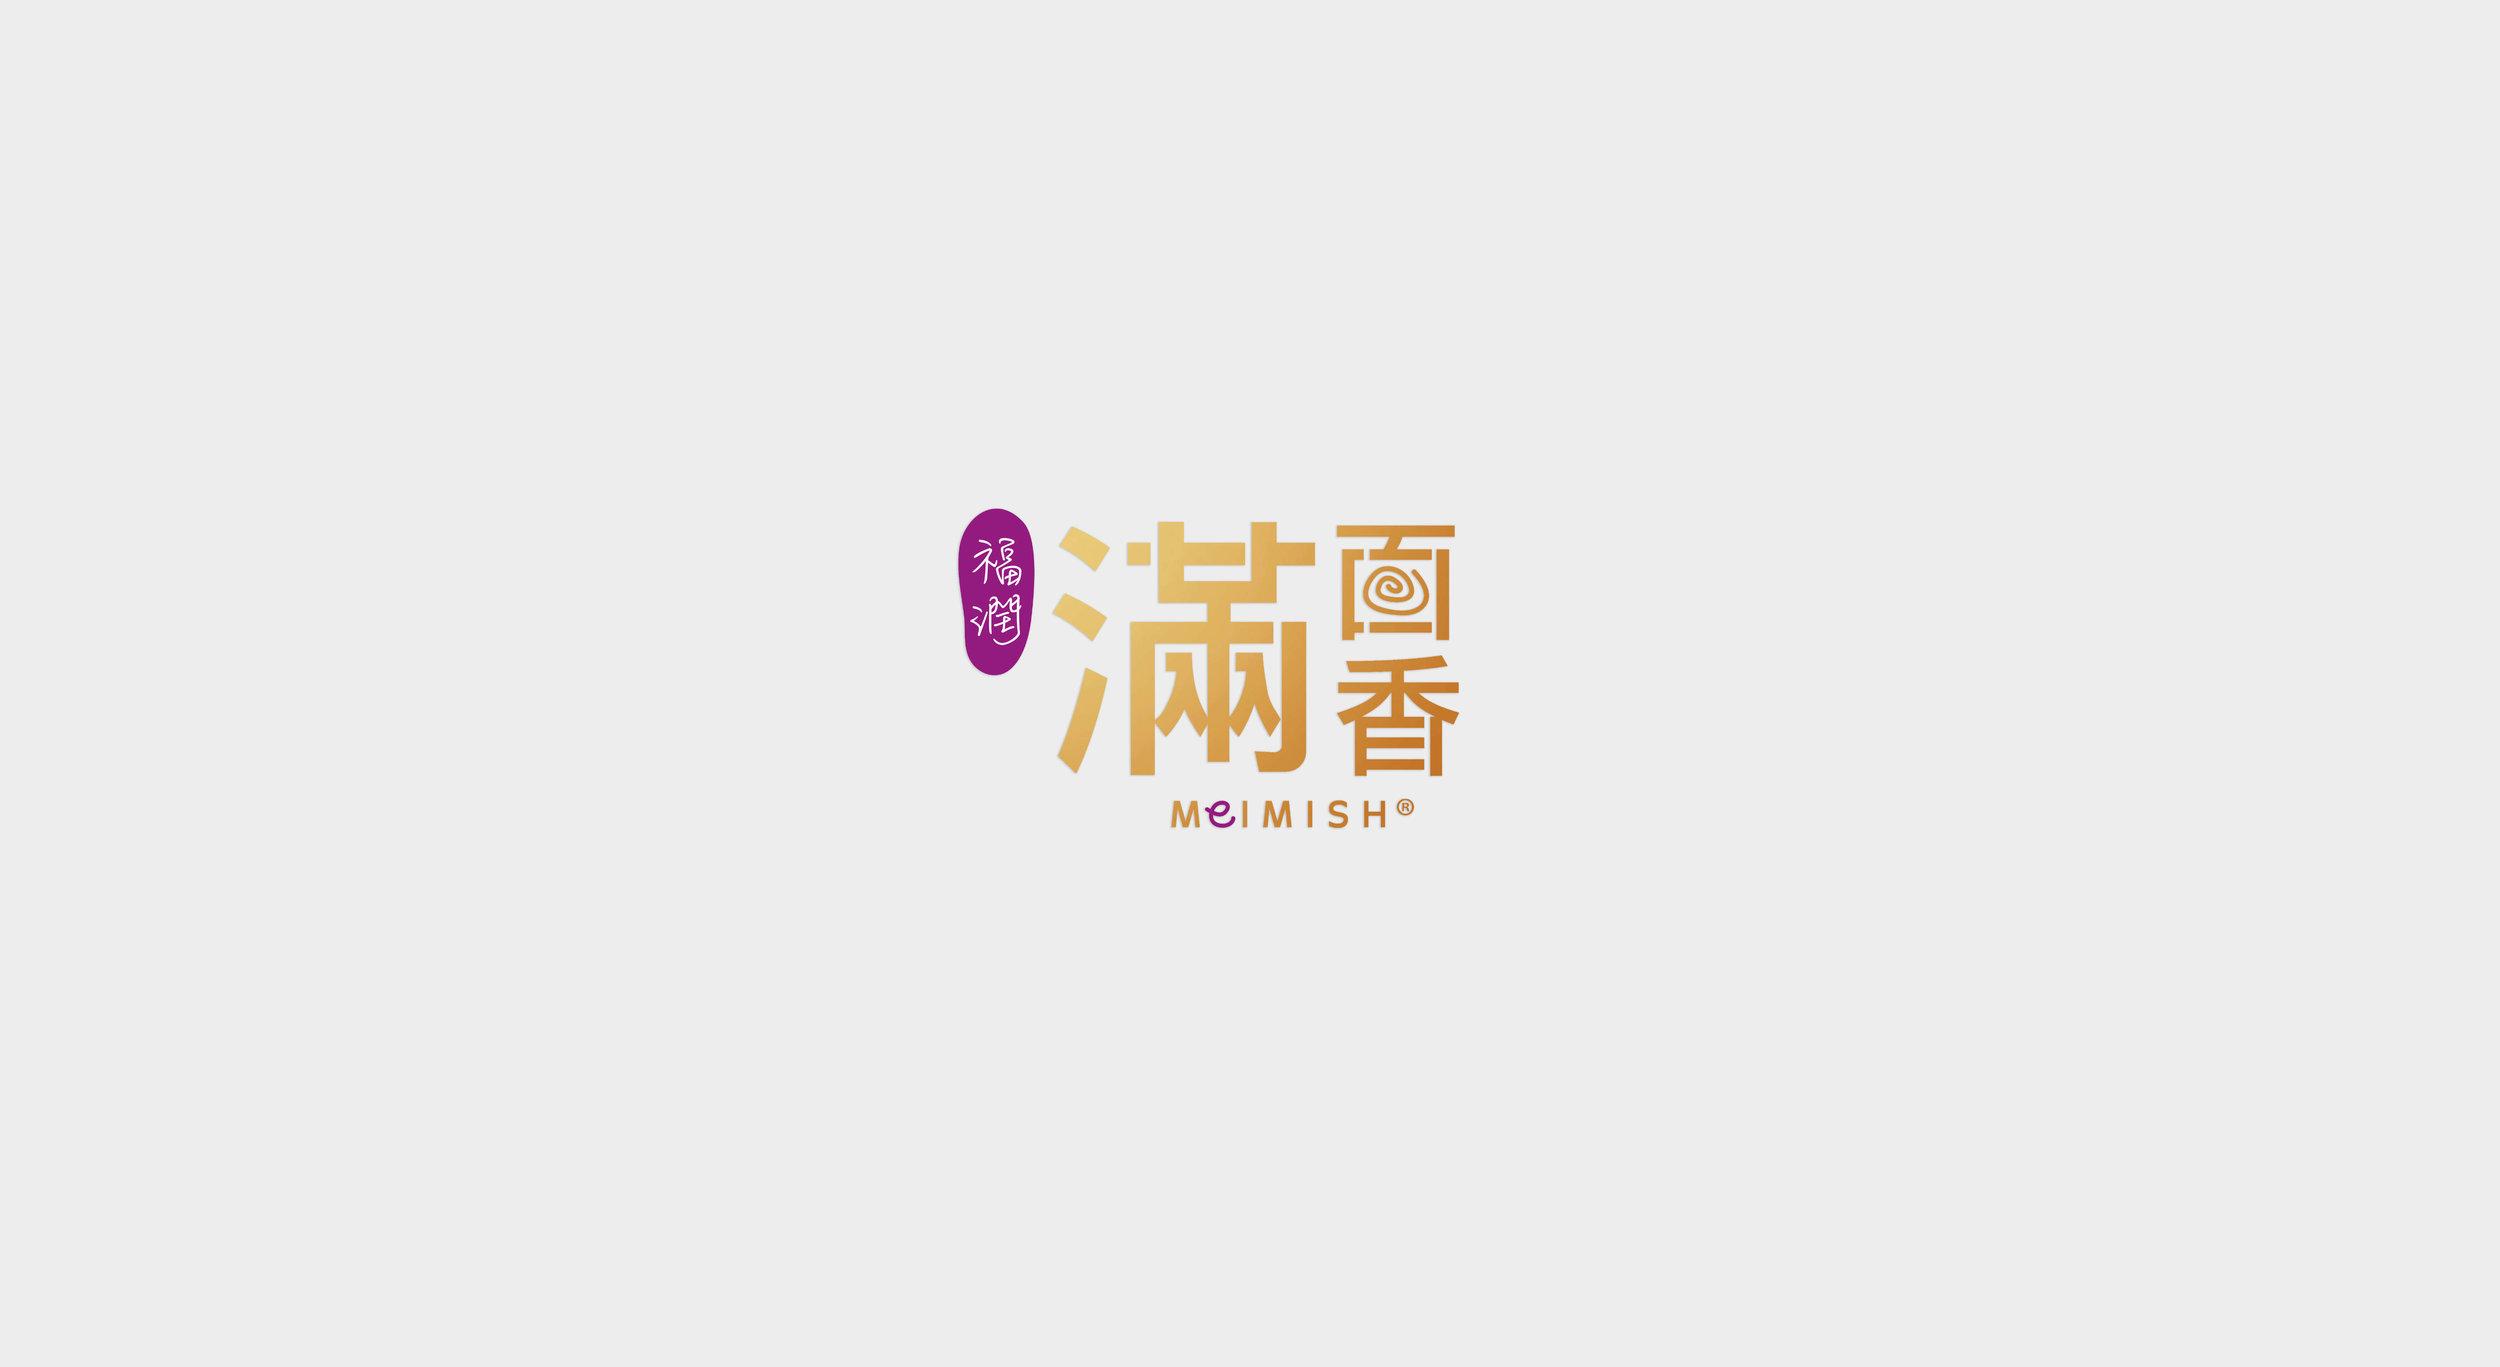 01_Meimish_identity.jpg